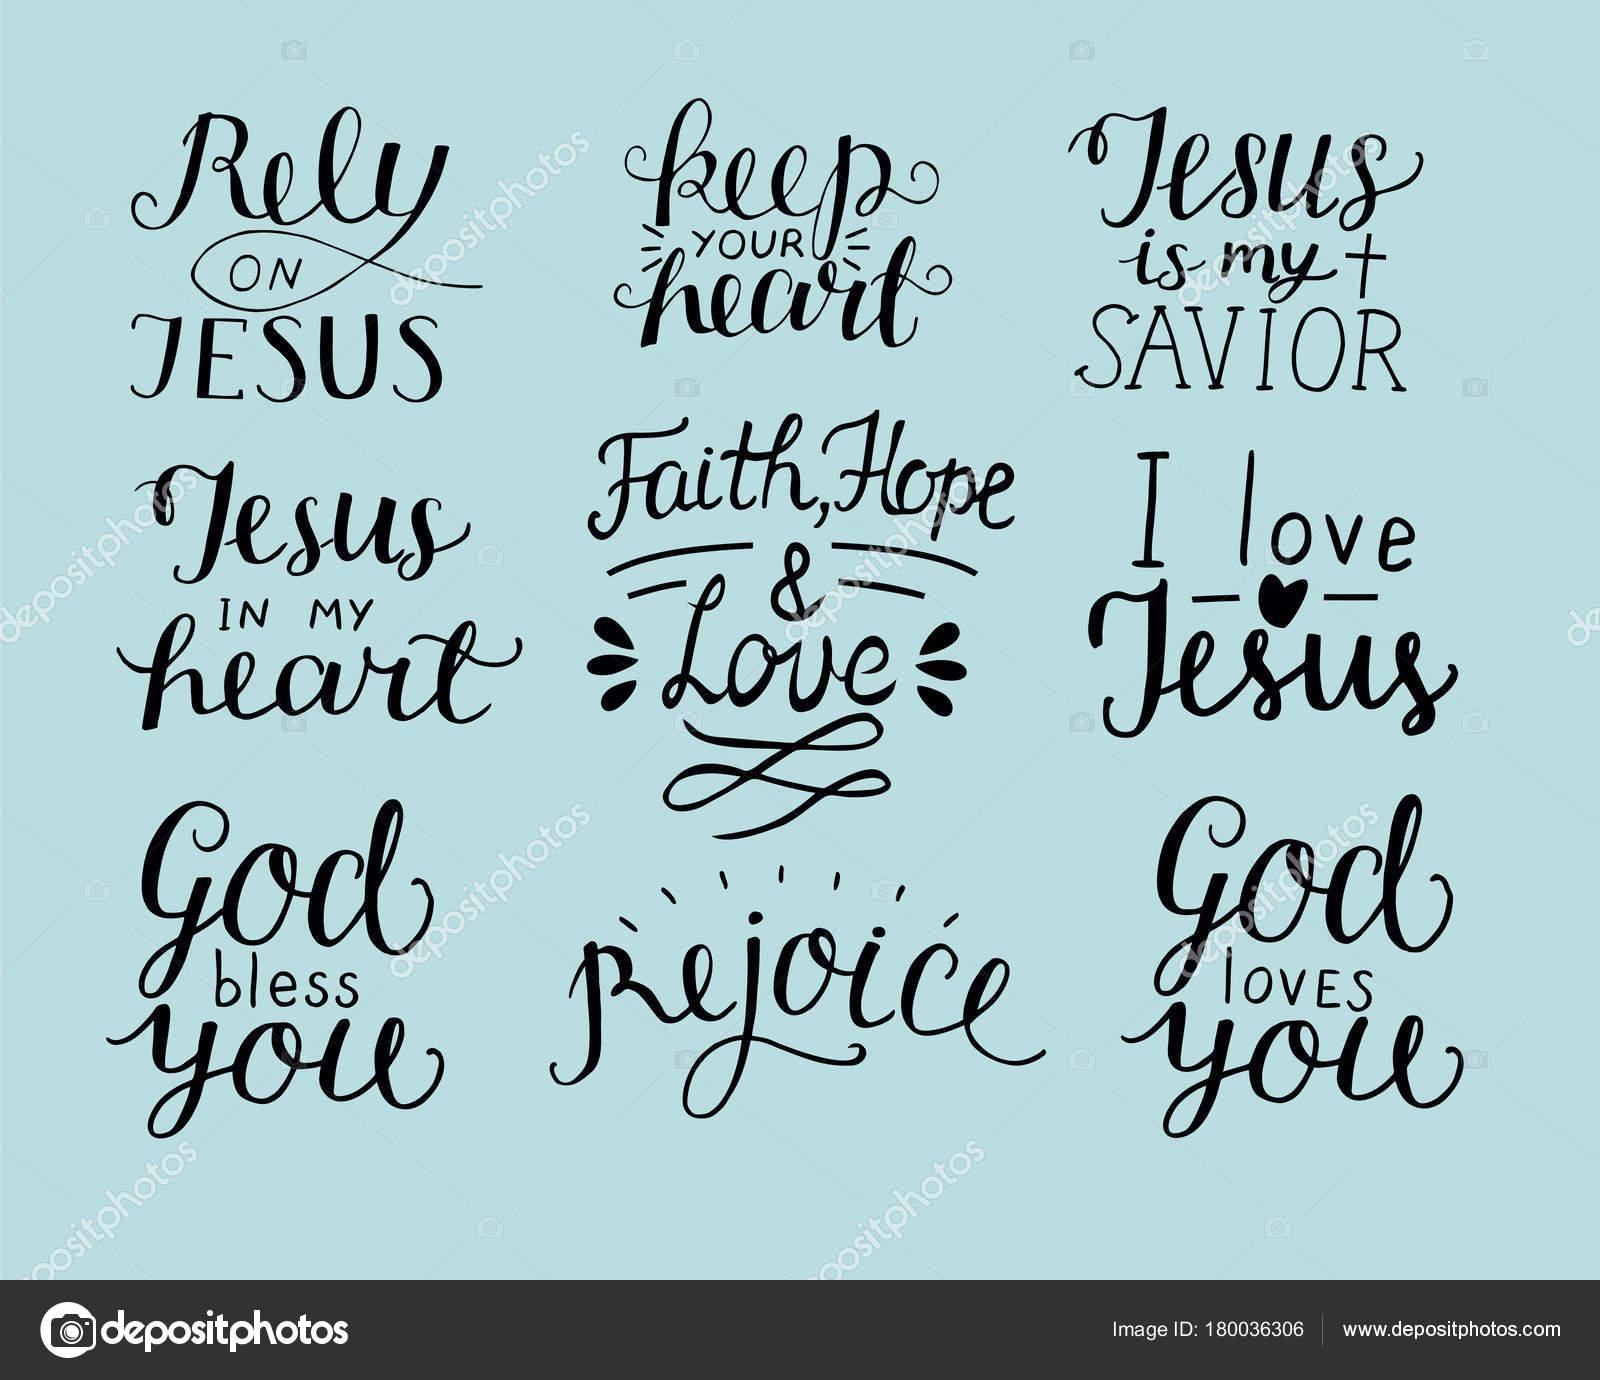 Juego De Mano 9 Letras Frases Cristianas Dios Te Bendiga Confiar En